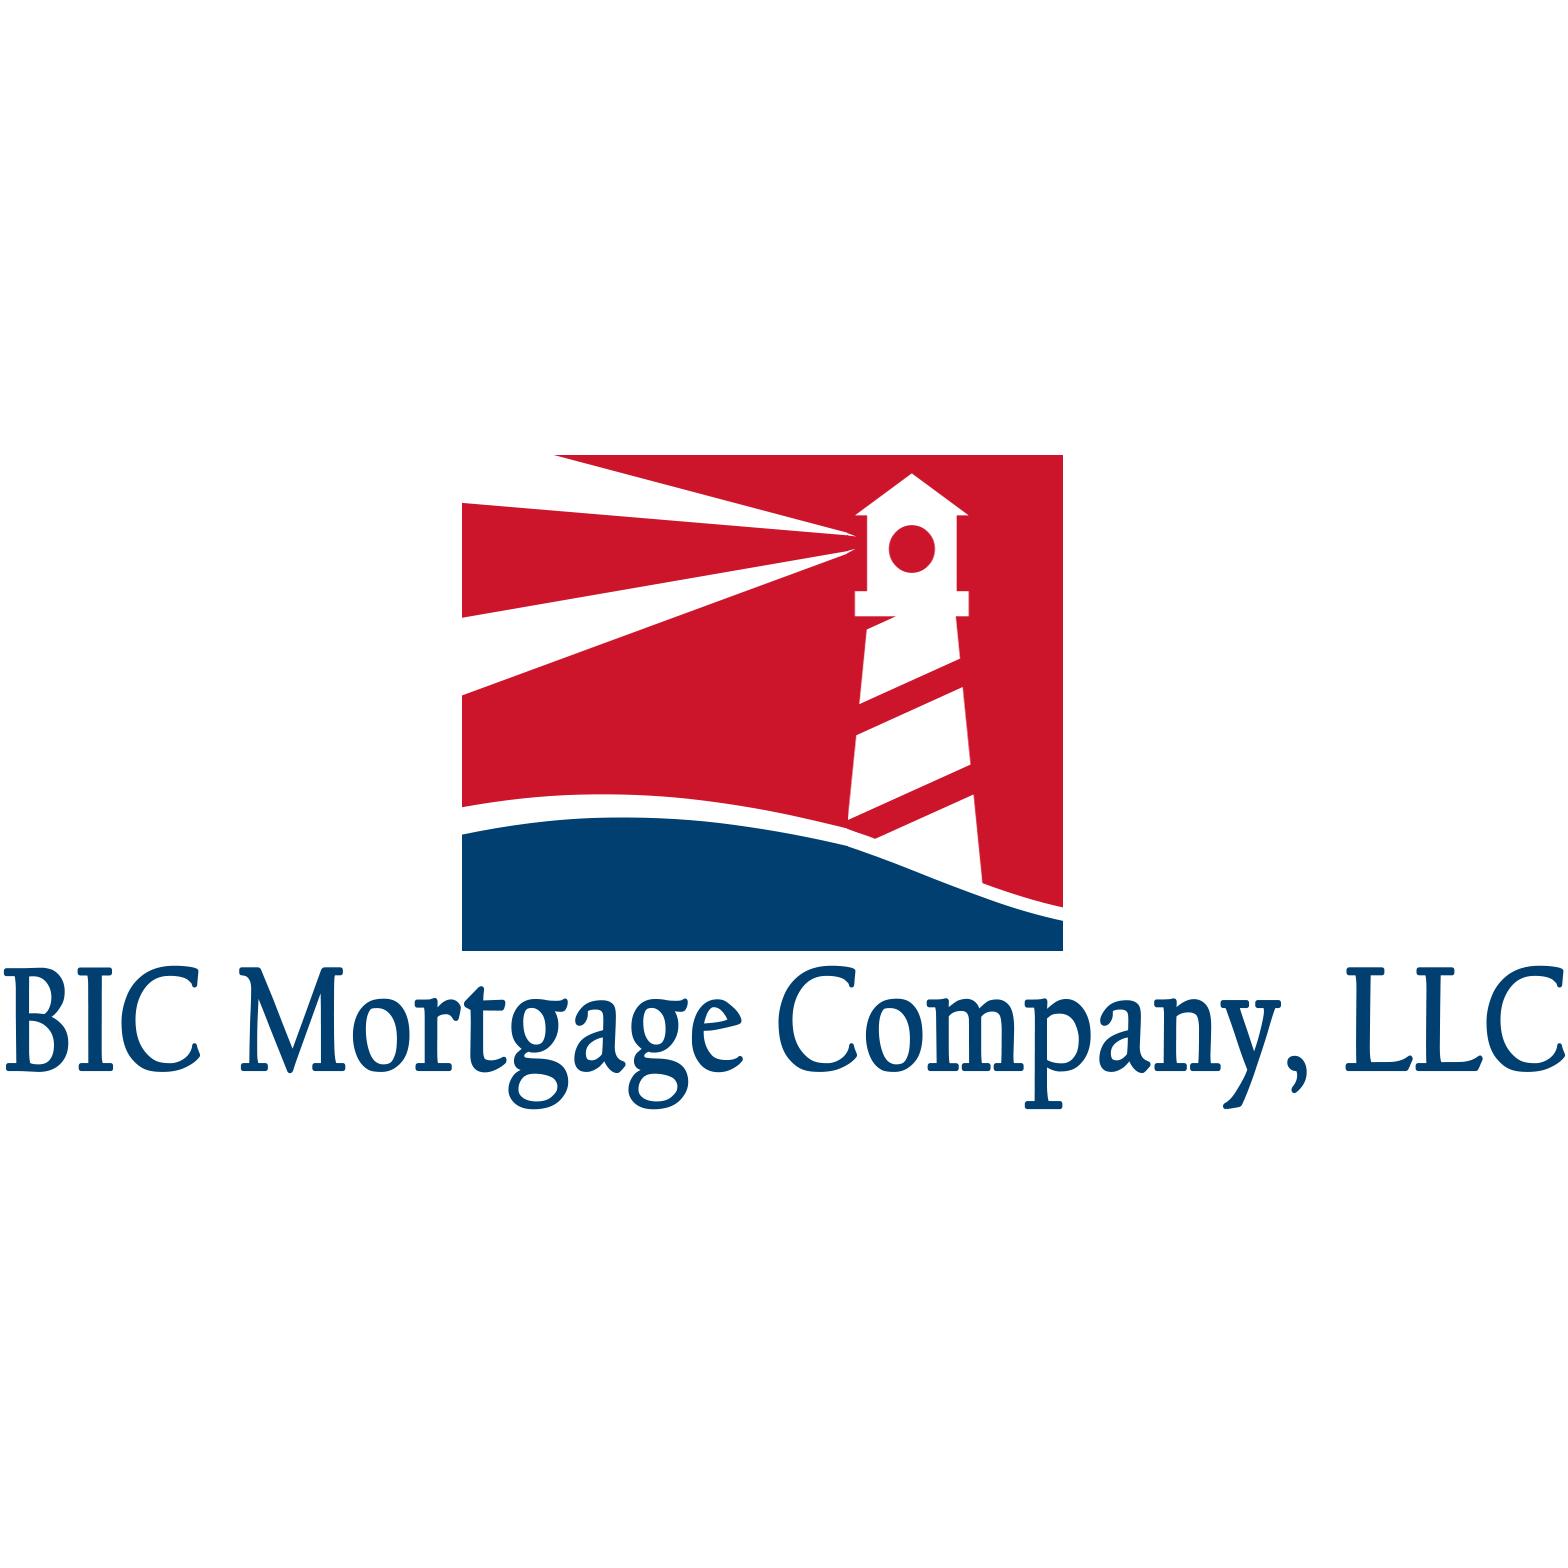 BIC Mortgage Company, LLC